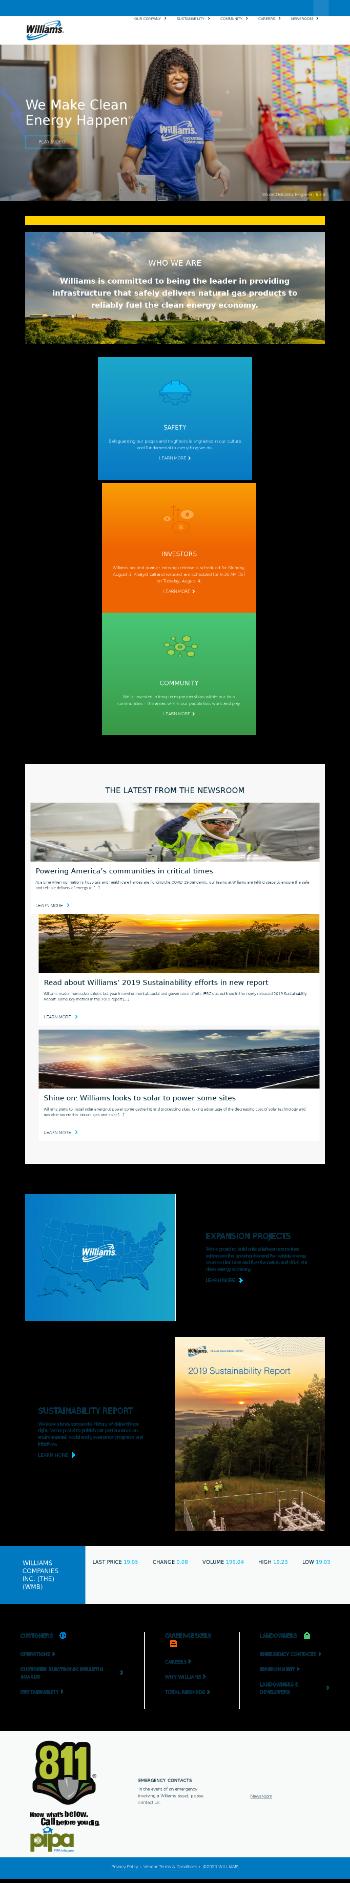 The Williams Companies, Inc. Website Screenshot